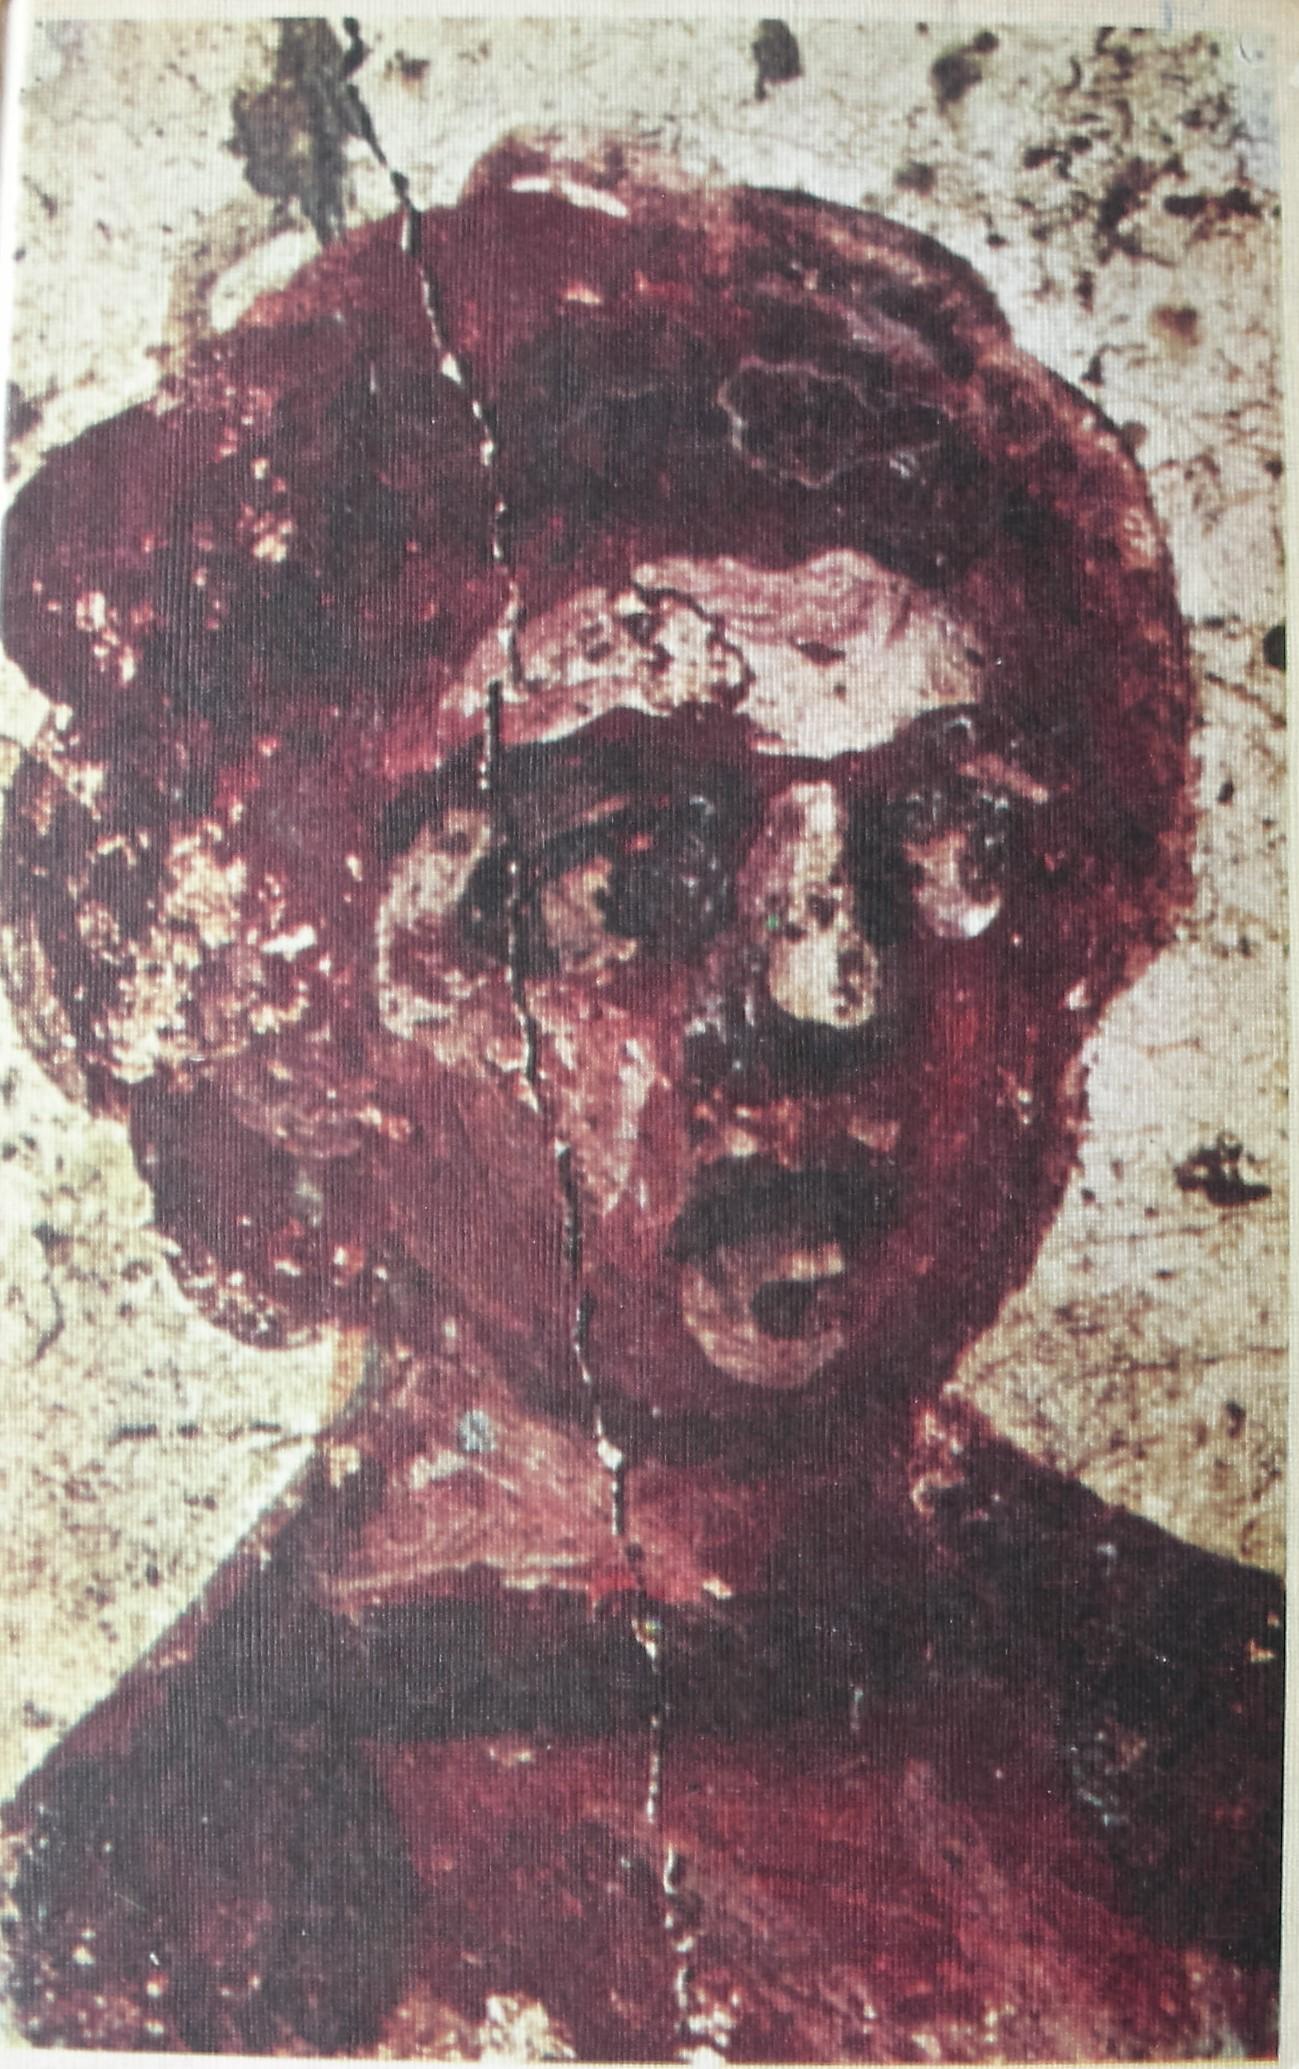 La pittura cristiana primitiva